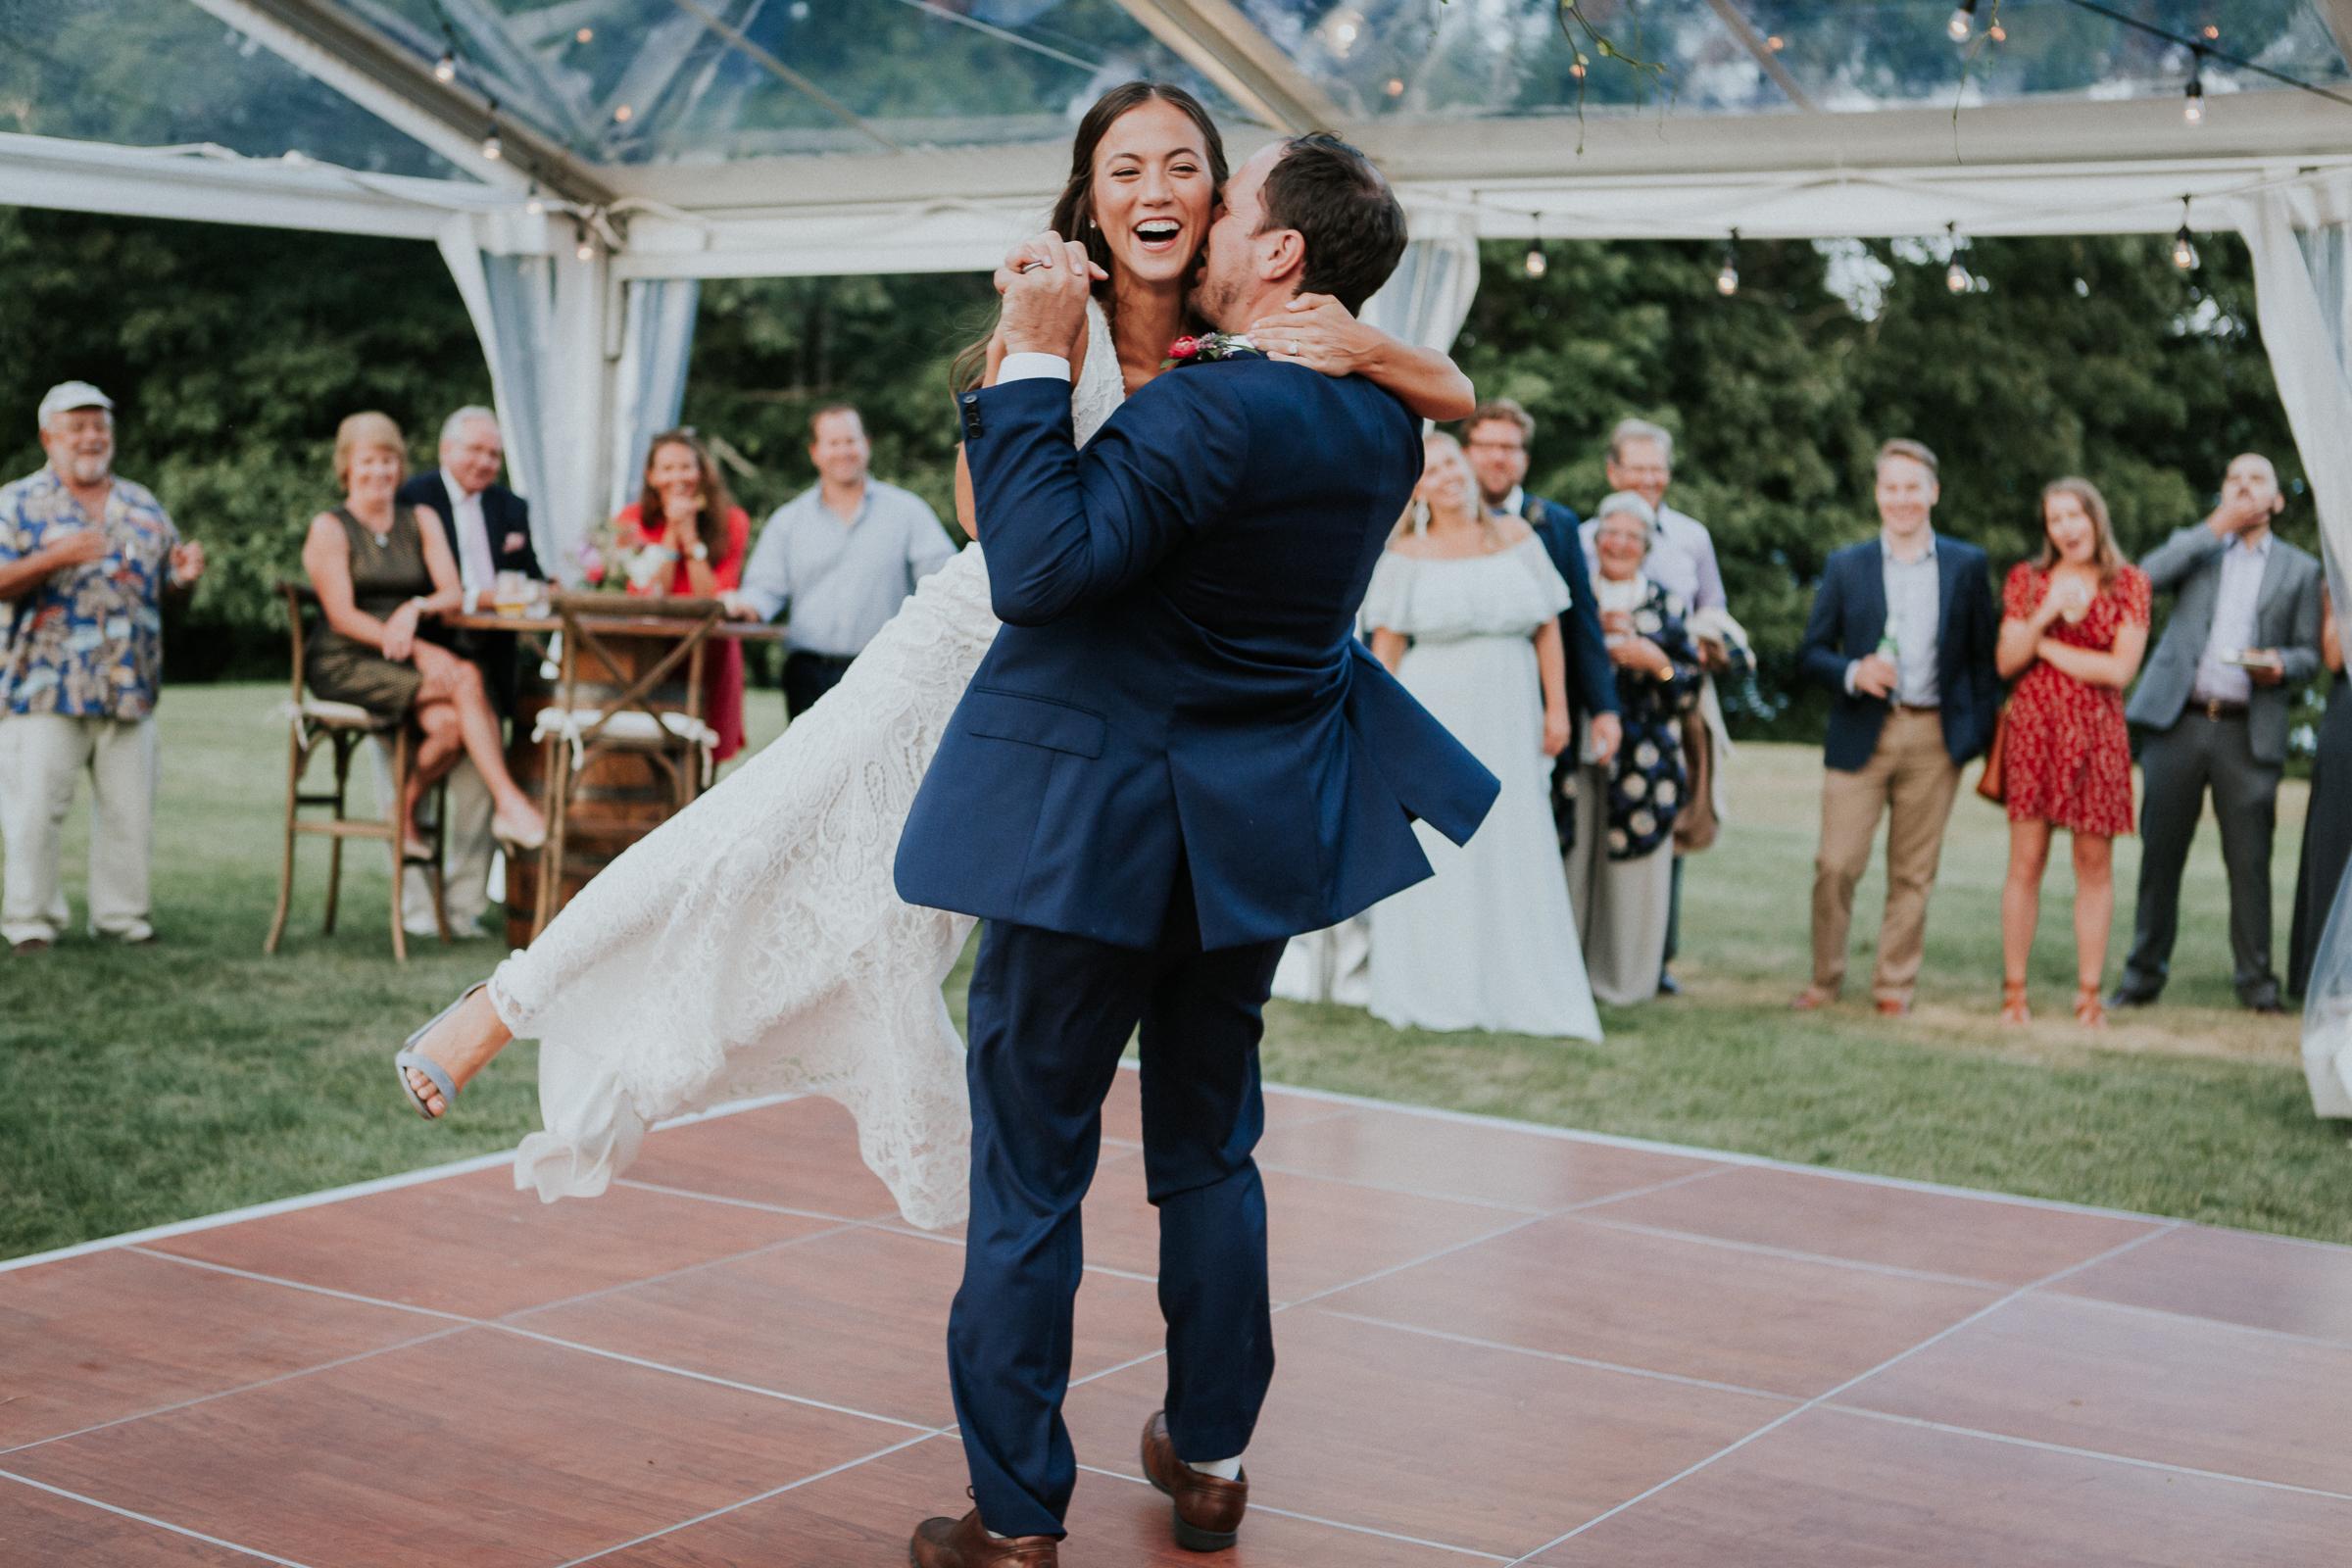 New-York-Documentary-Wedding-Photography-Best-Of-2017-by-Elvira-Kalviste-Photography-3.jpg